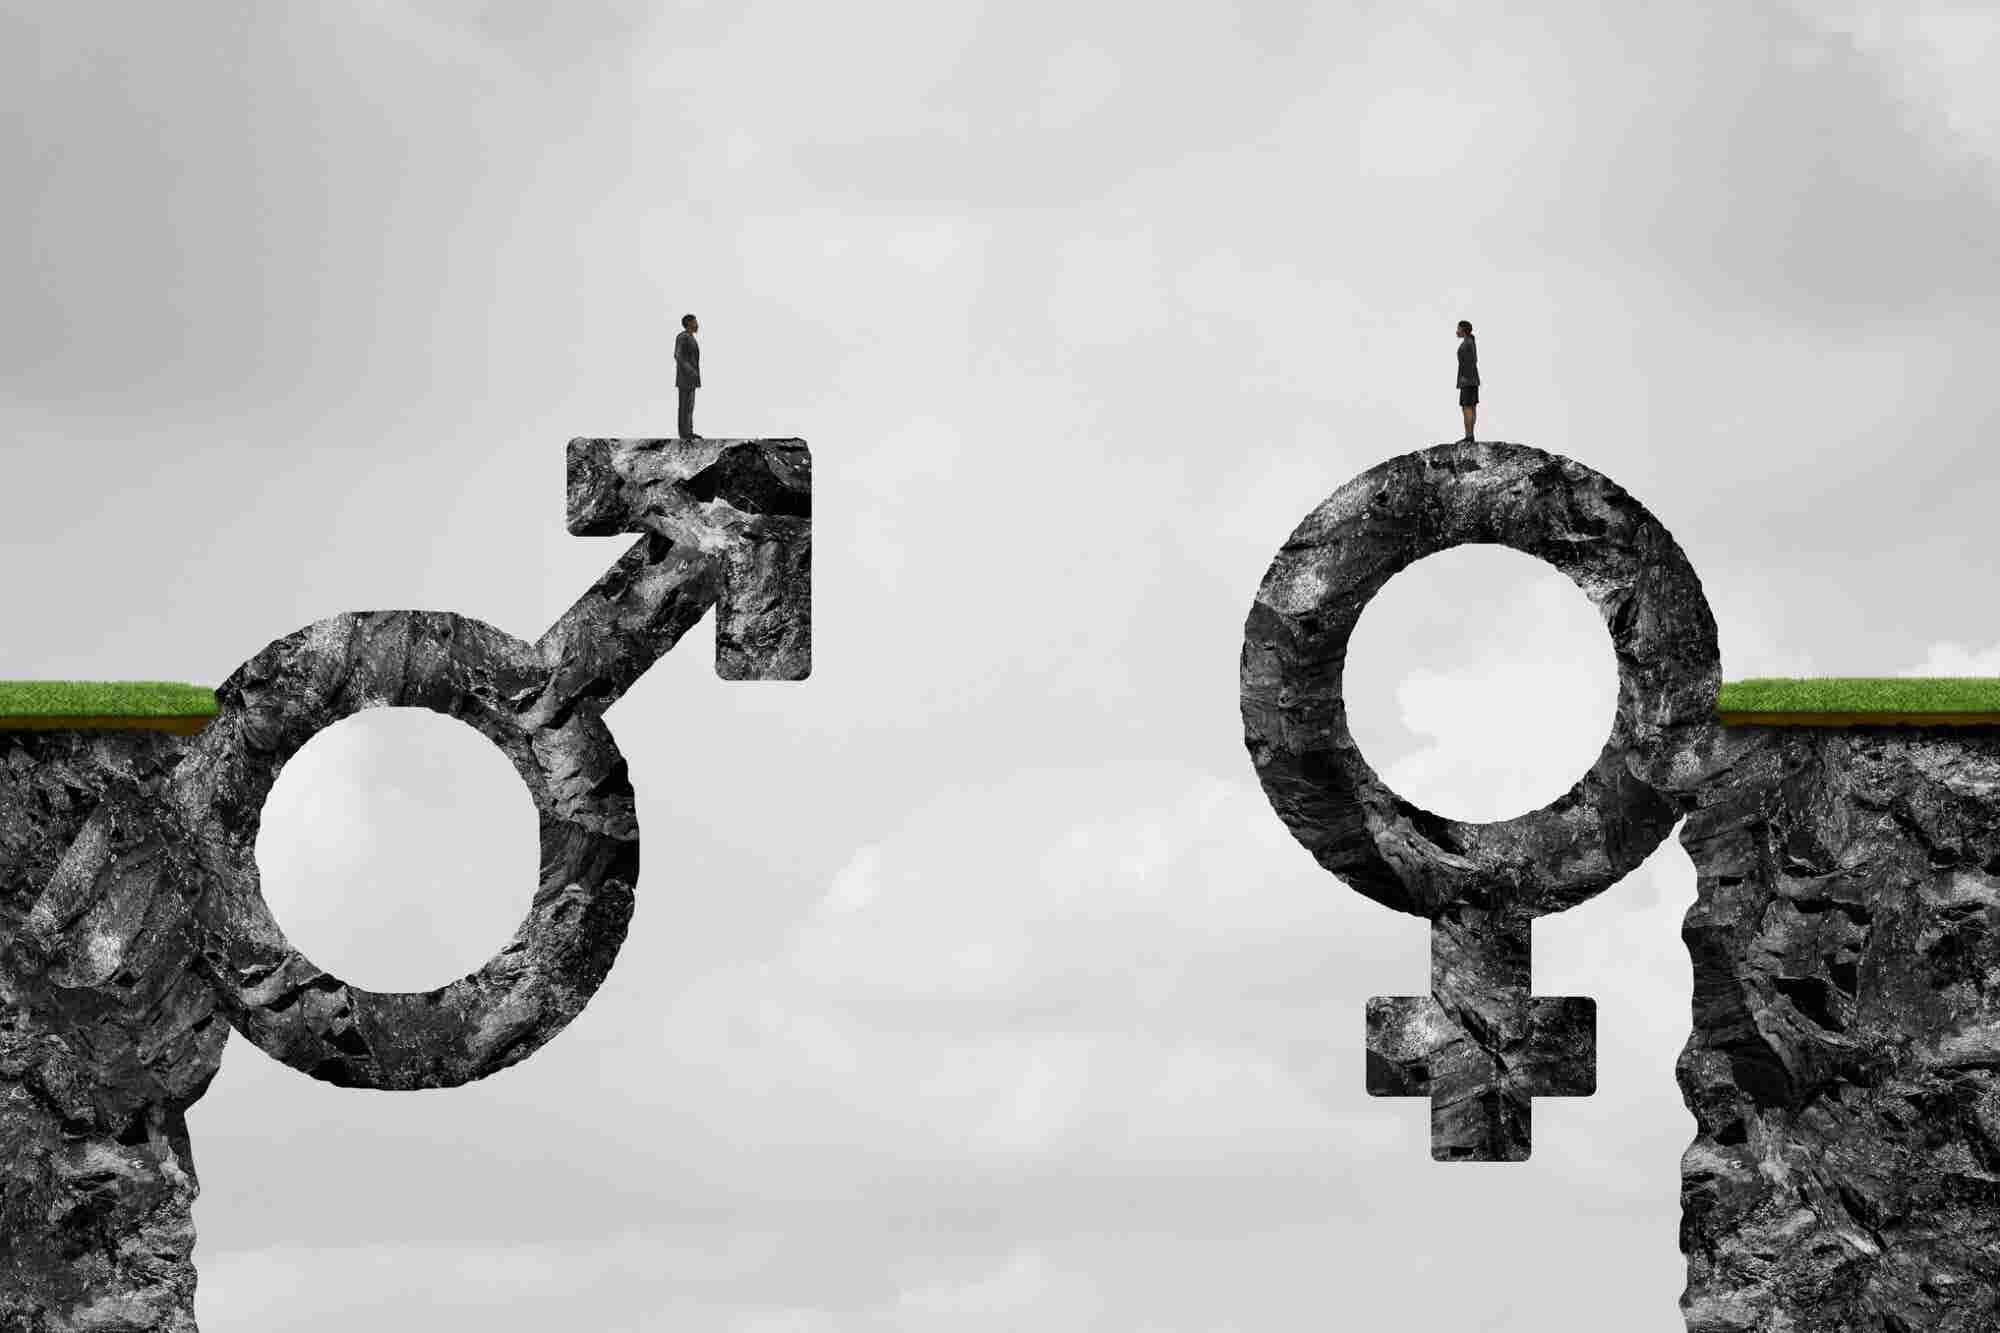 How Women Can Finally Bridge the Gender Gap in the C-Suite